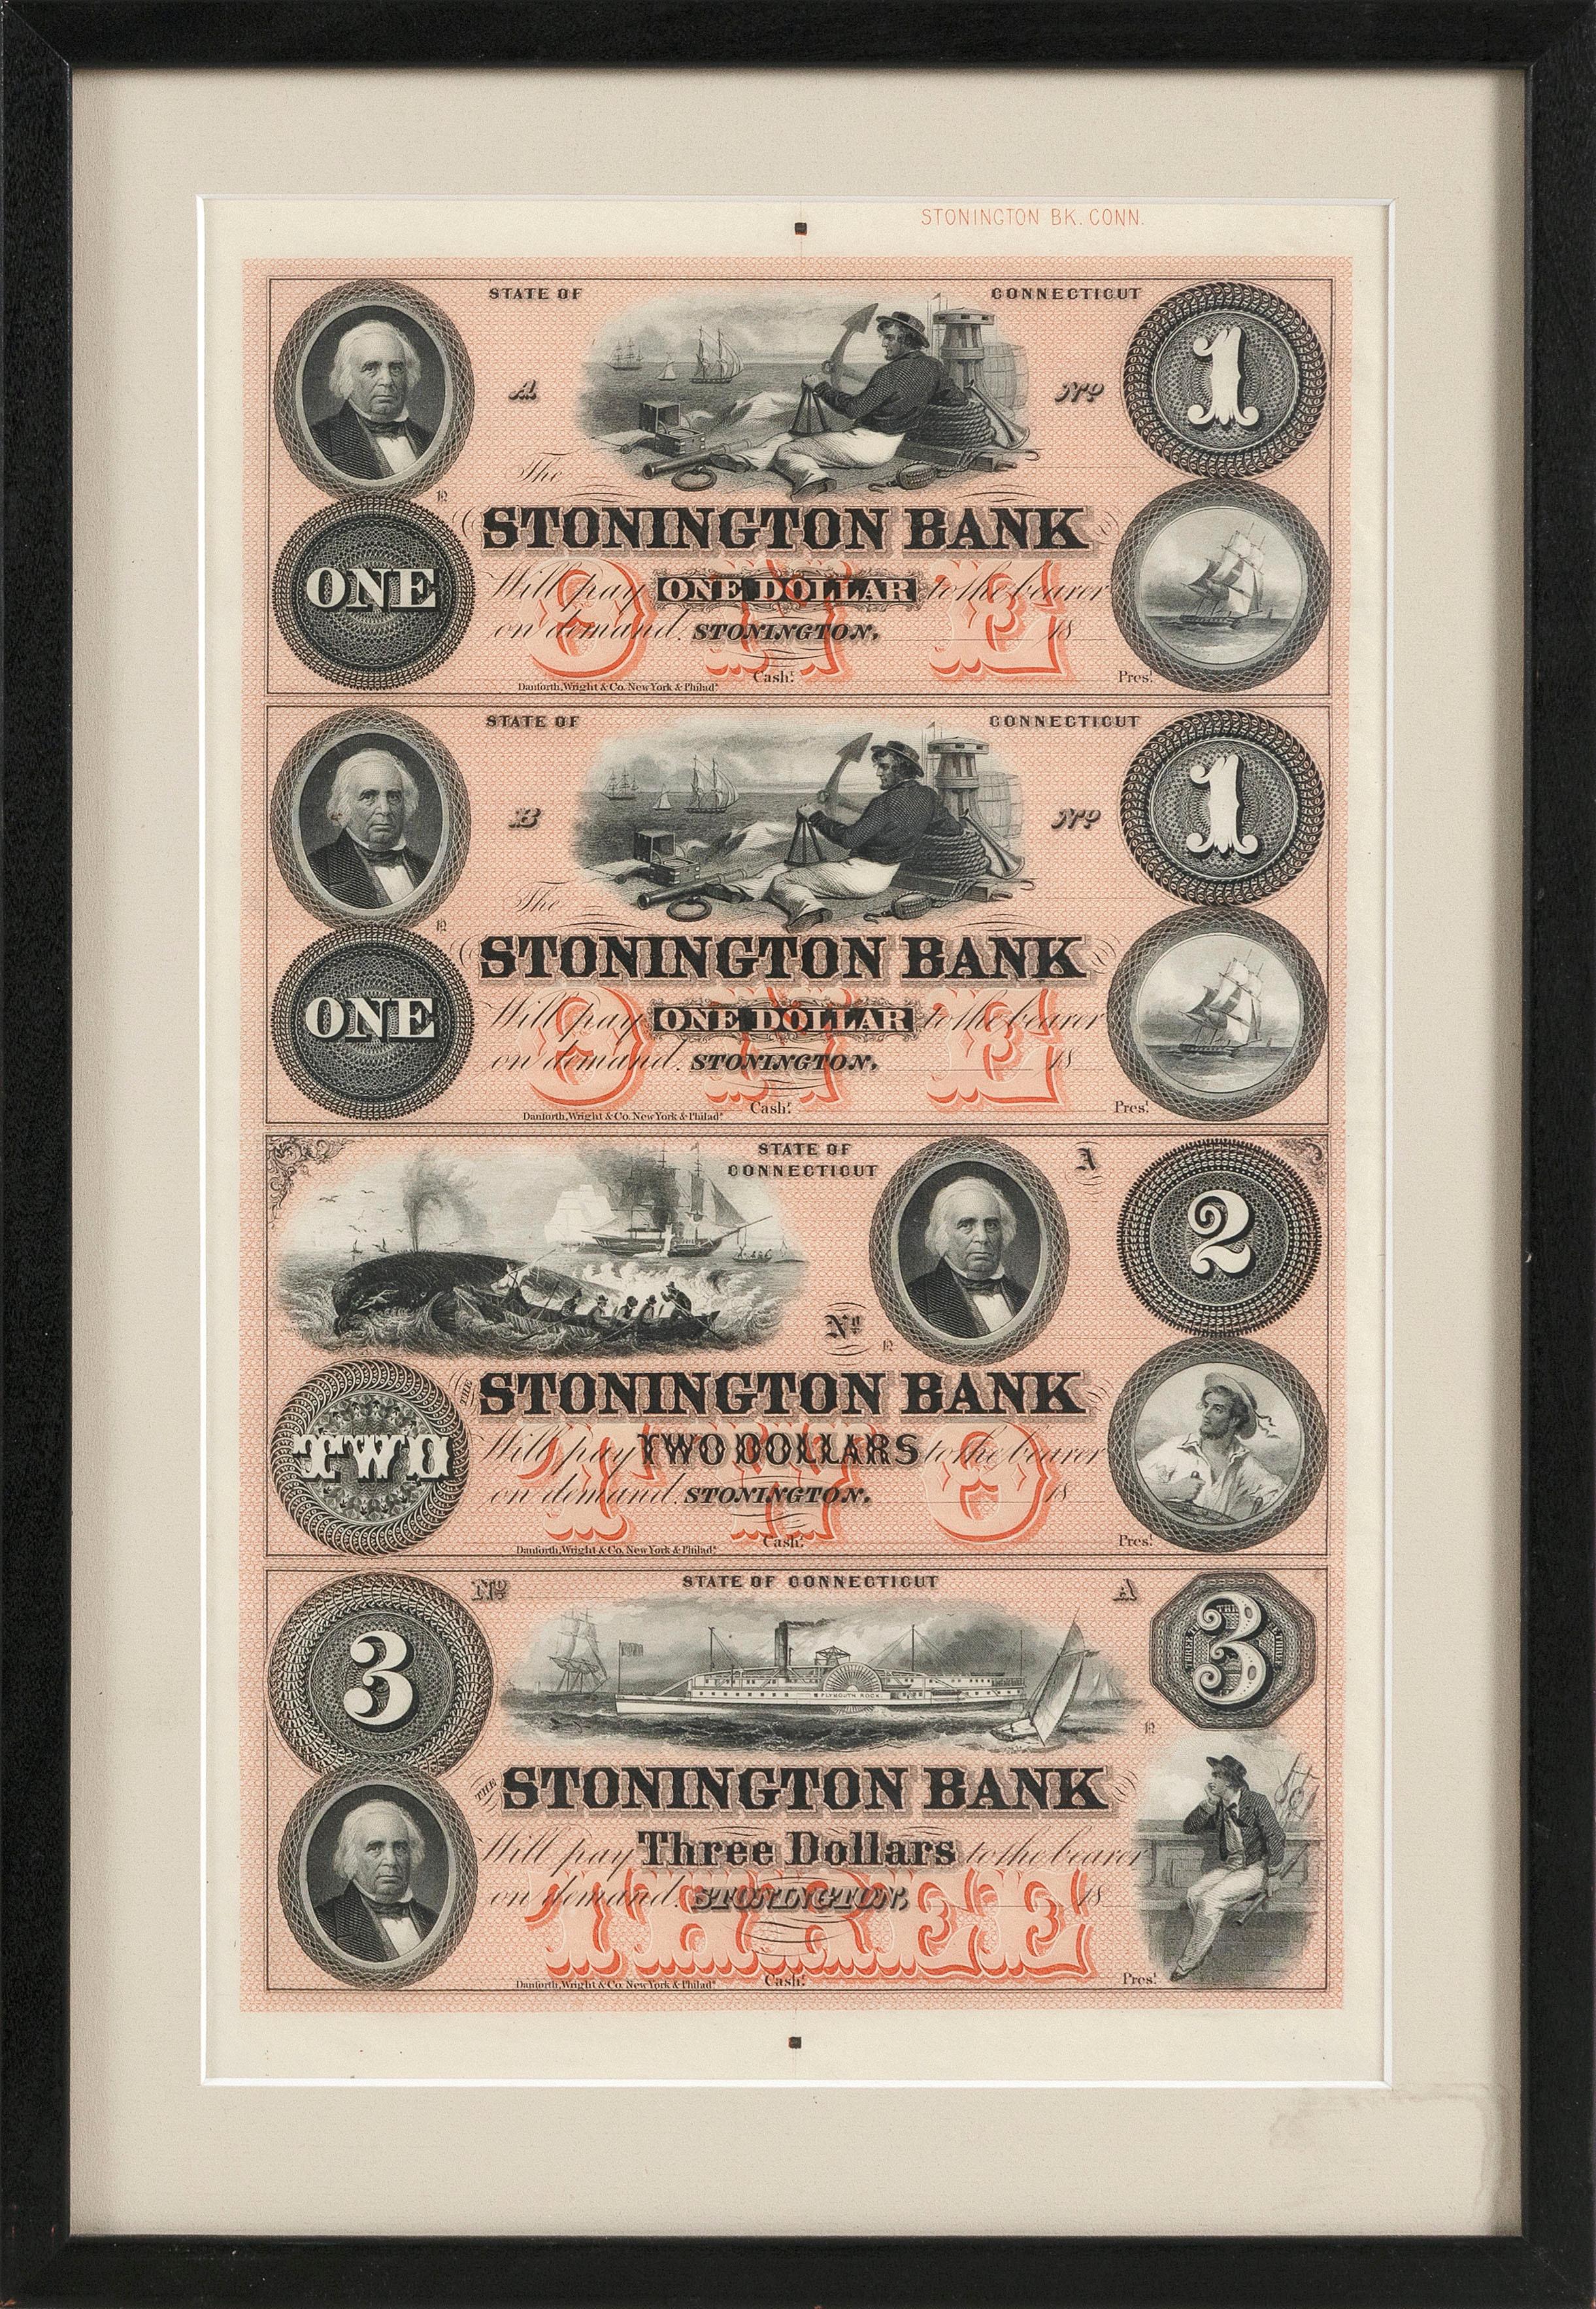 "RARE UNCUT SHEET OF STONINGTON BANK DOLLAR BILLS Connecticut, 19th Century 12.5"" x 8"" sight. Framed 15.5"" x 10.5""."